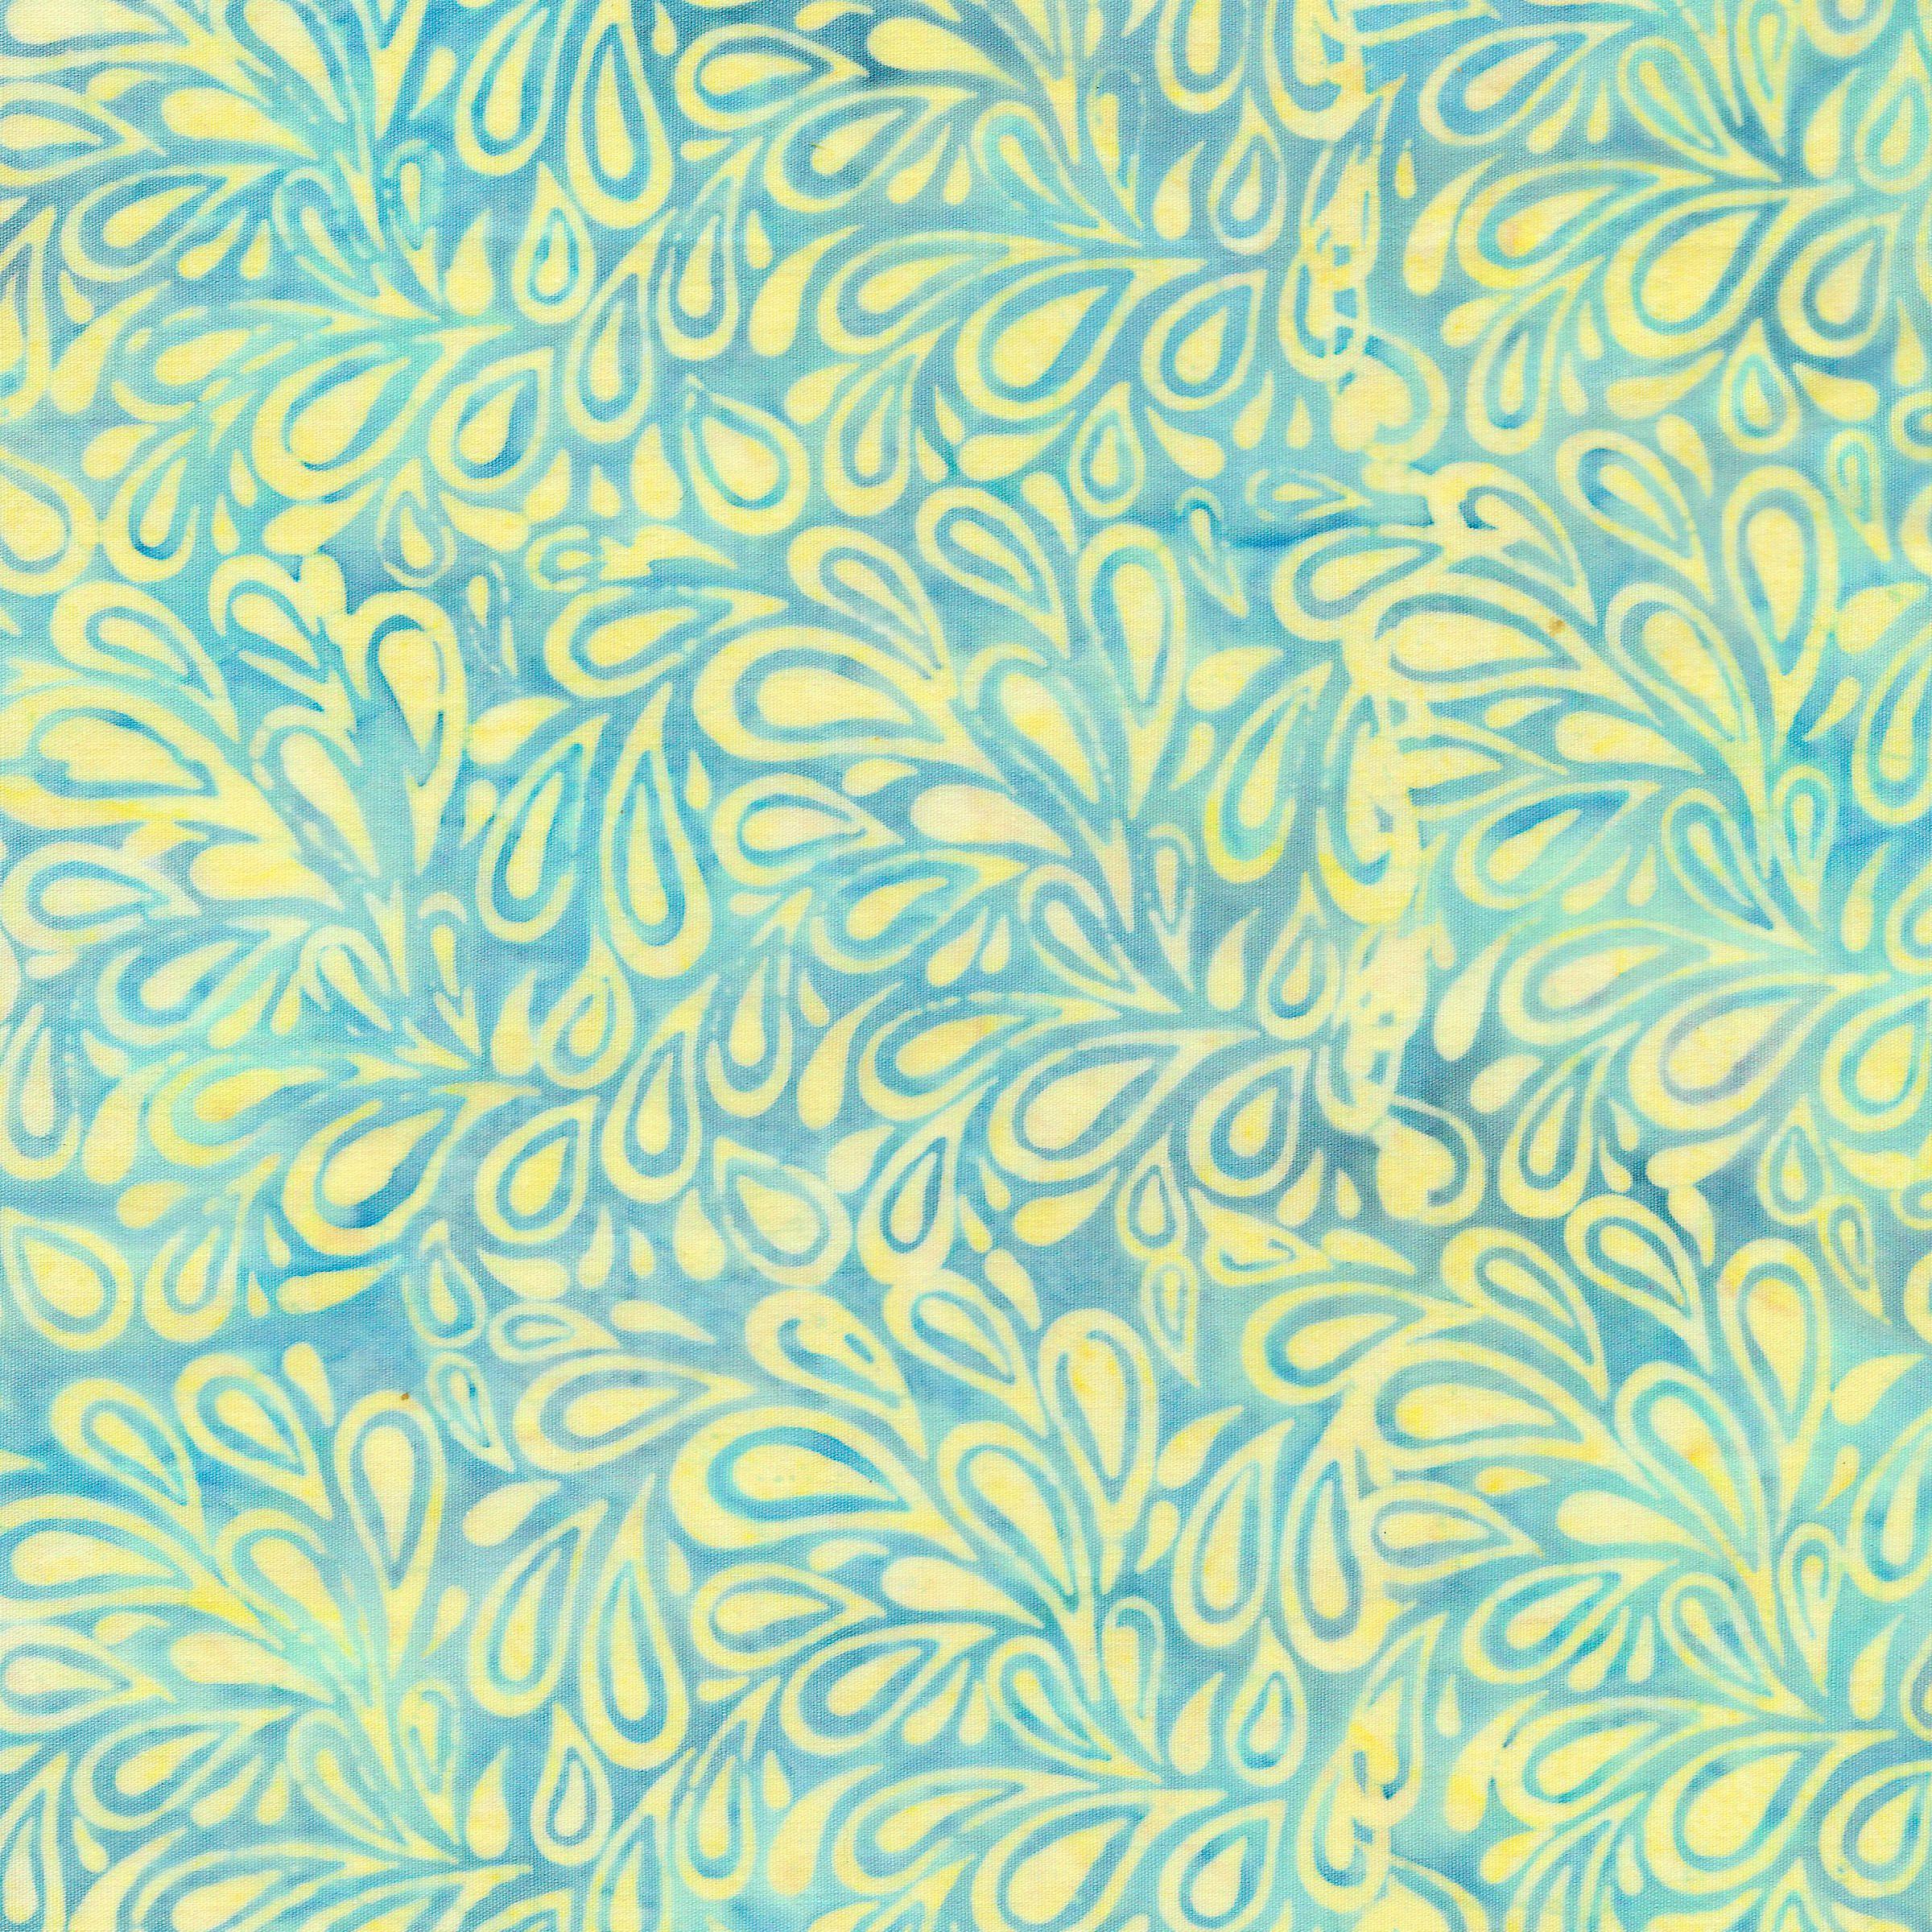 121820110 / Paisley Drops -Buttercup